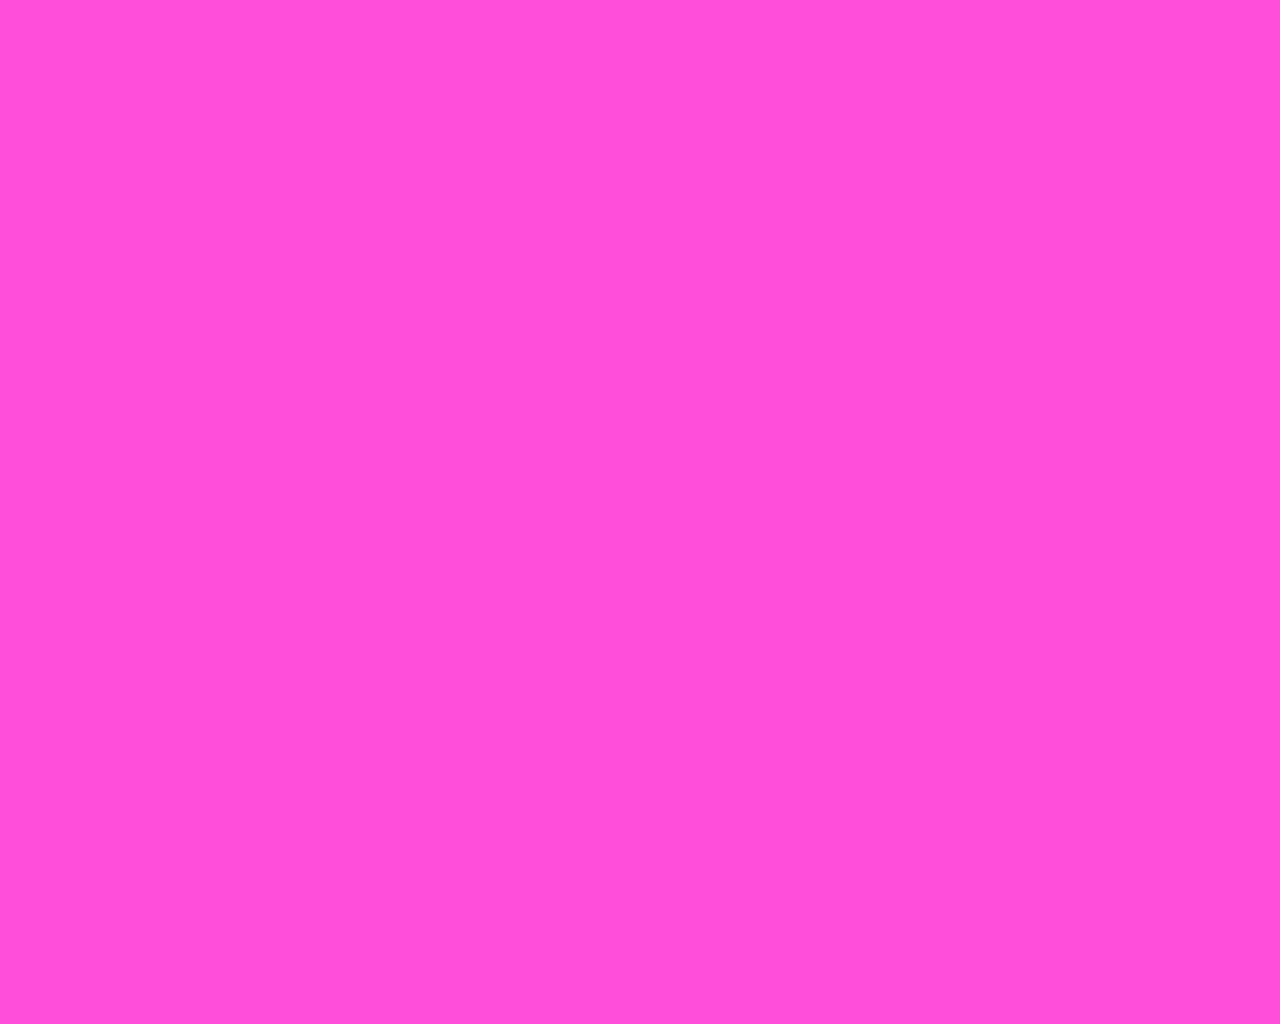 1280x1024 Purple Pizzazz Solid Color Background